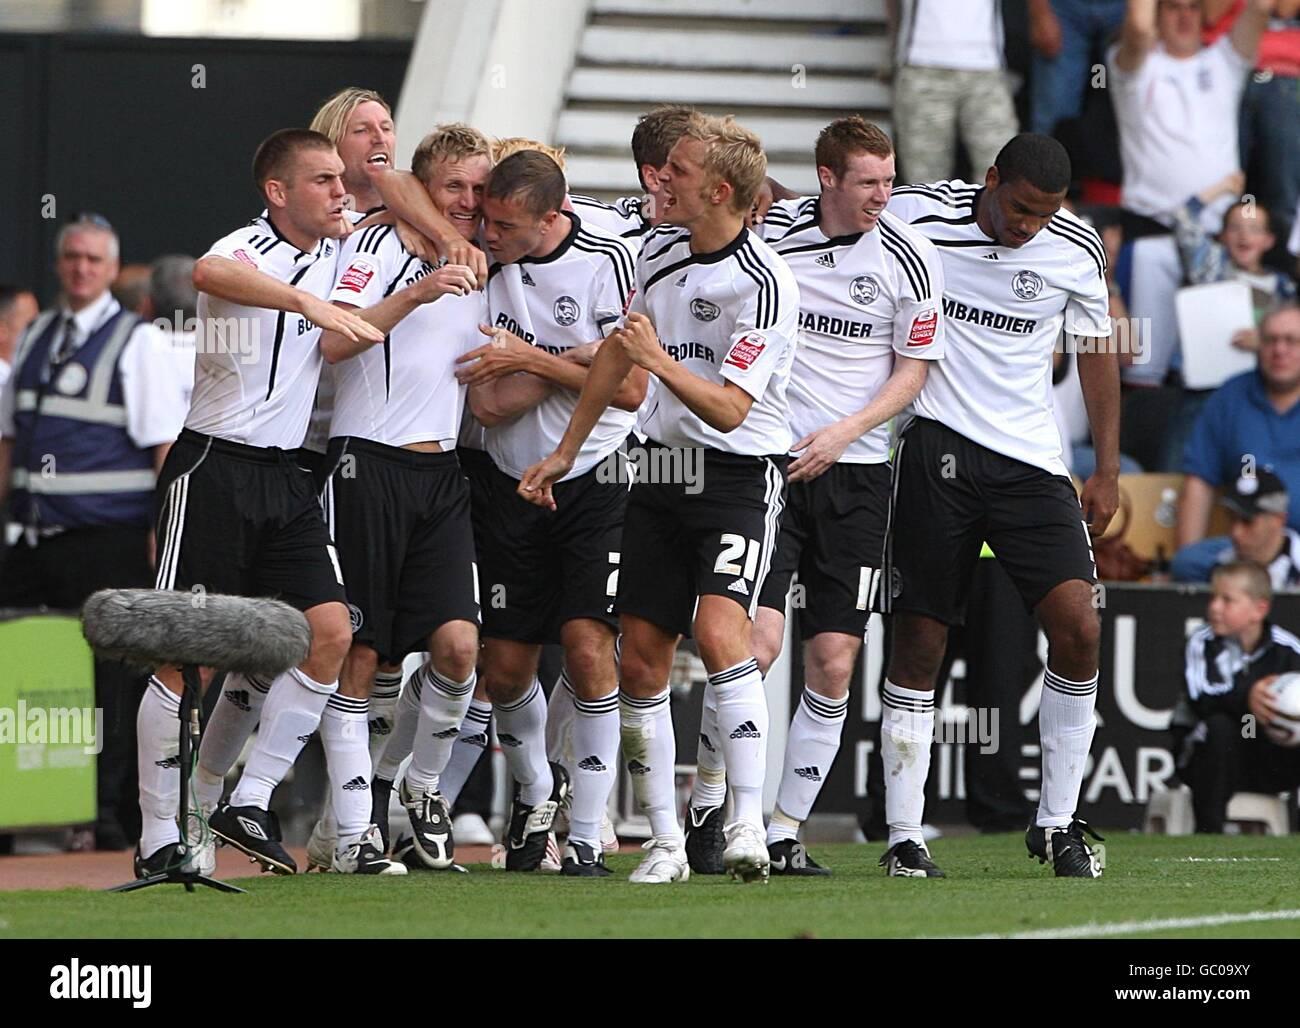 Soccer - Coca-Cola Football League Championship - Derby County v Peterborough United - Pride Park - Stock Image